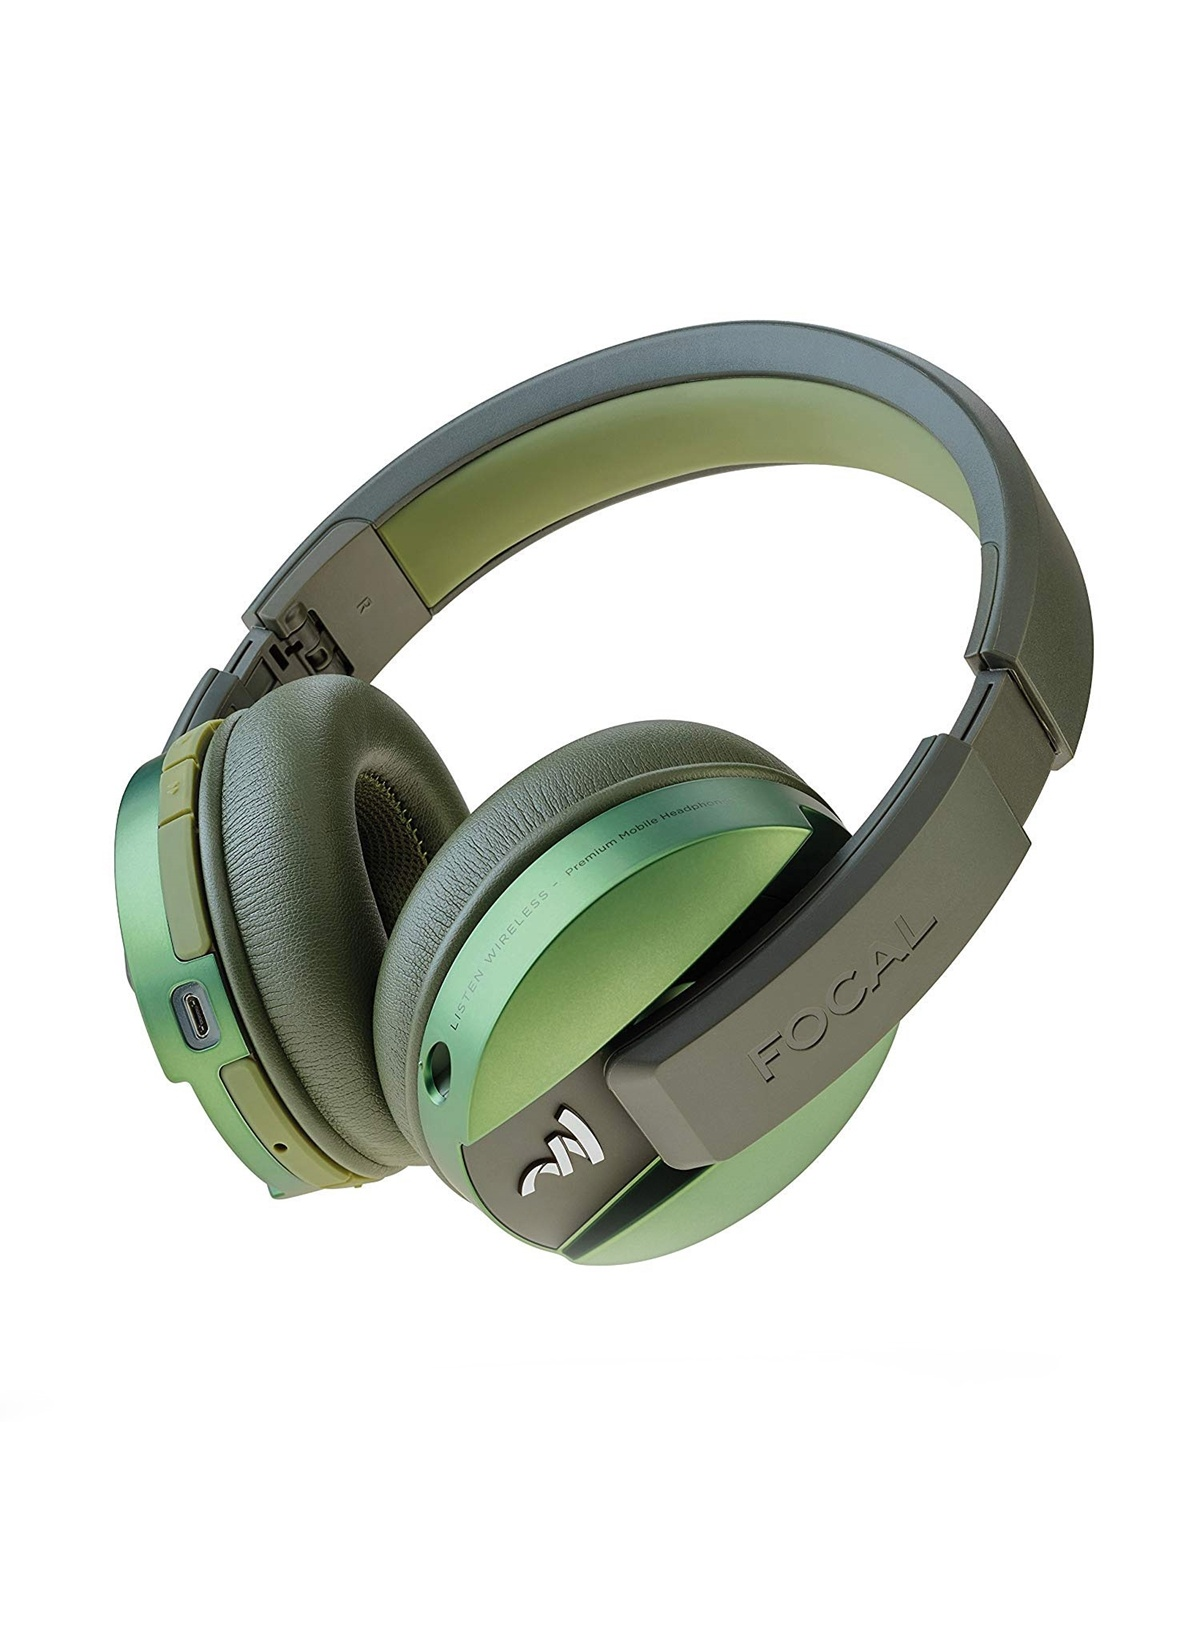 Standart Focal Listen Chic Yeşil Wireless Bluetooth Kulak Üstü Kulaklık